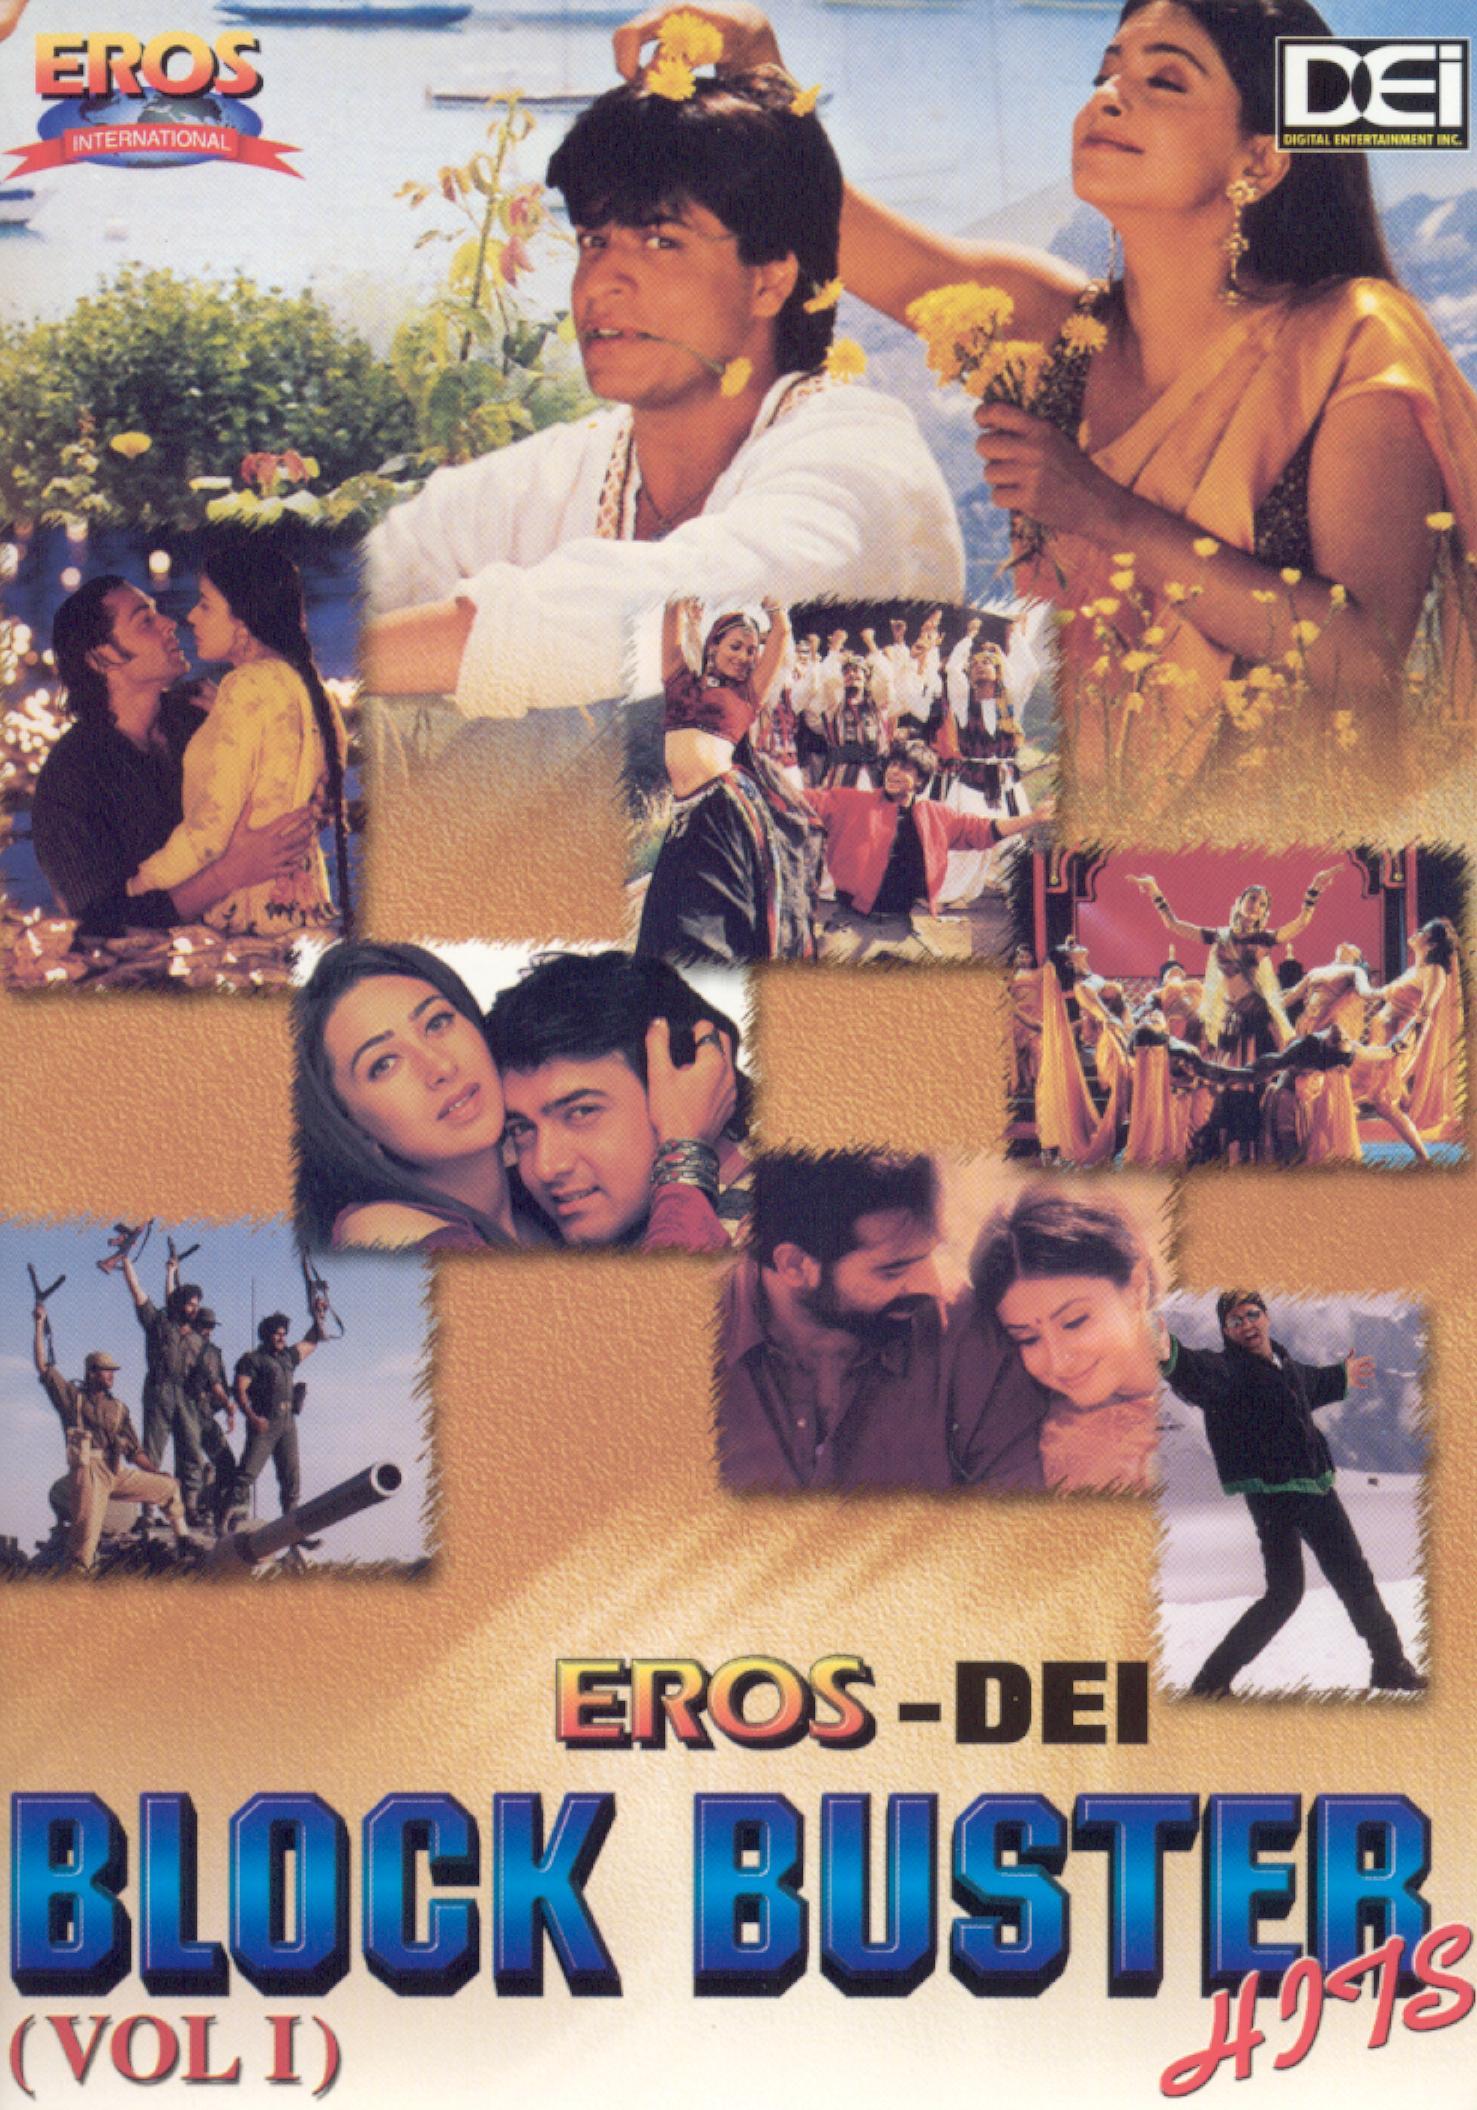 Eros-Dei Blockbuster Hits, Vol. 1